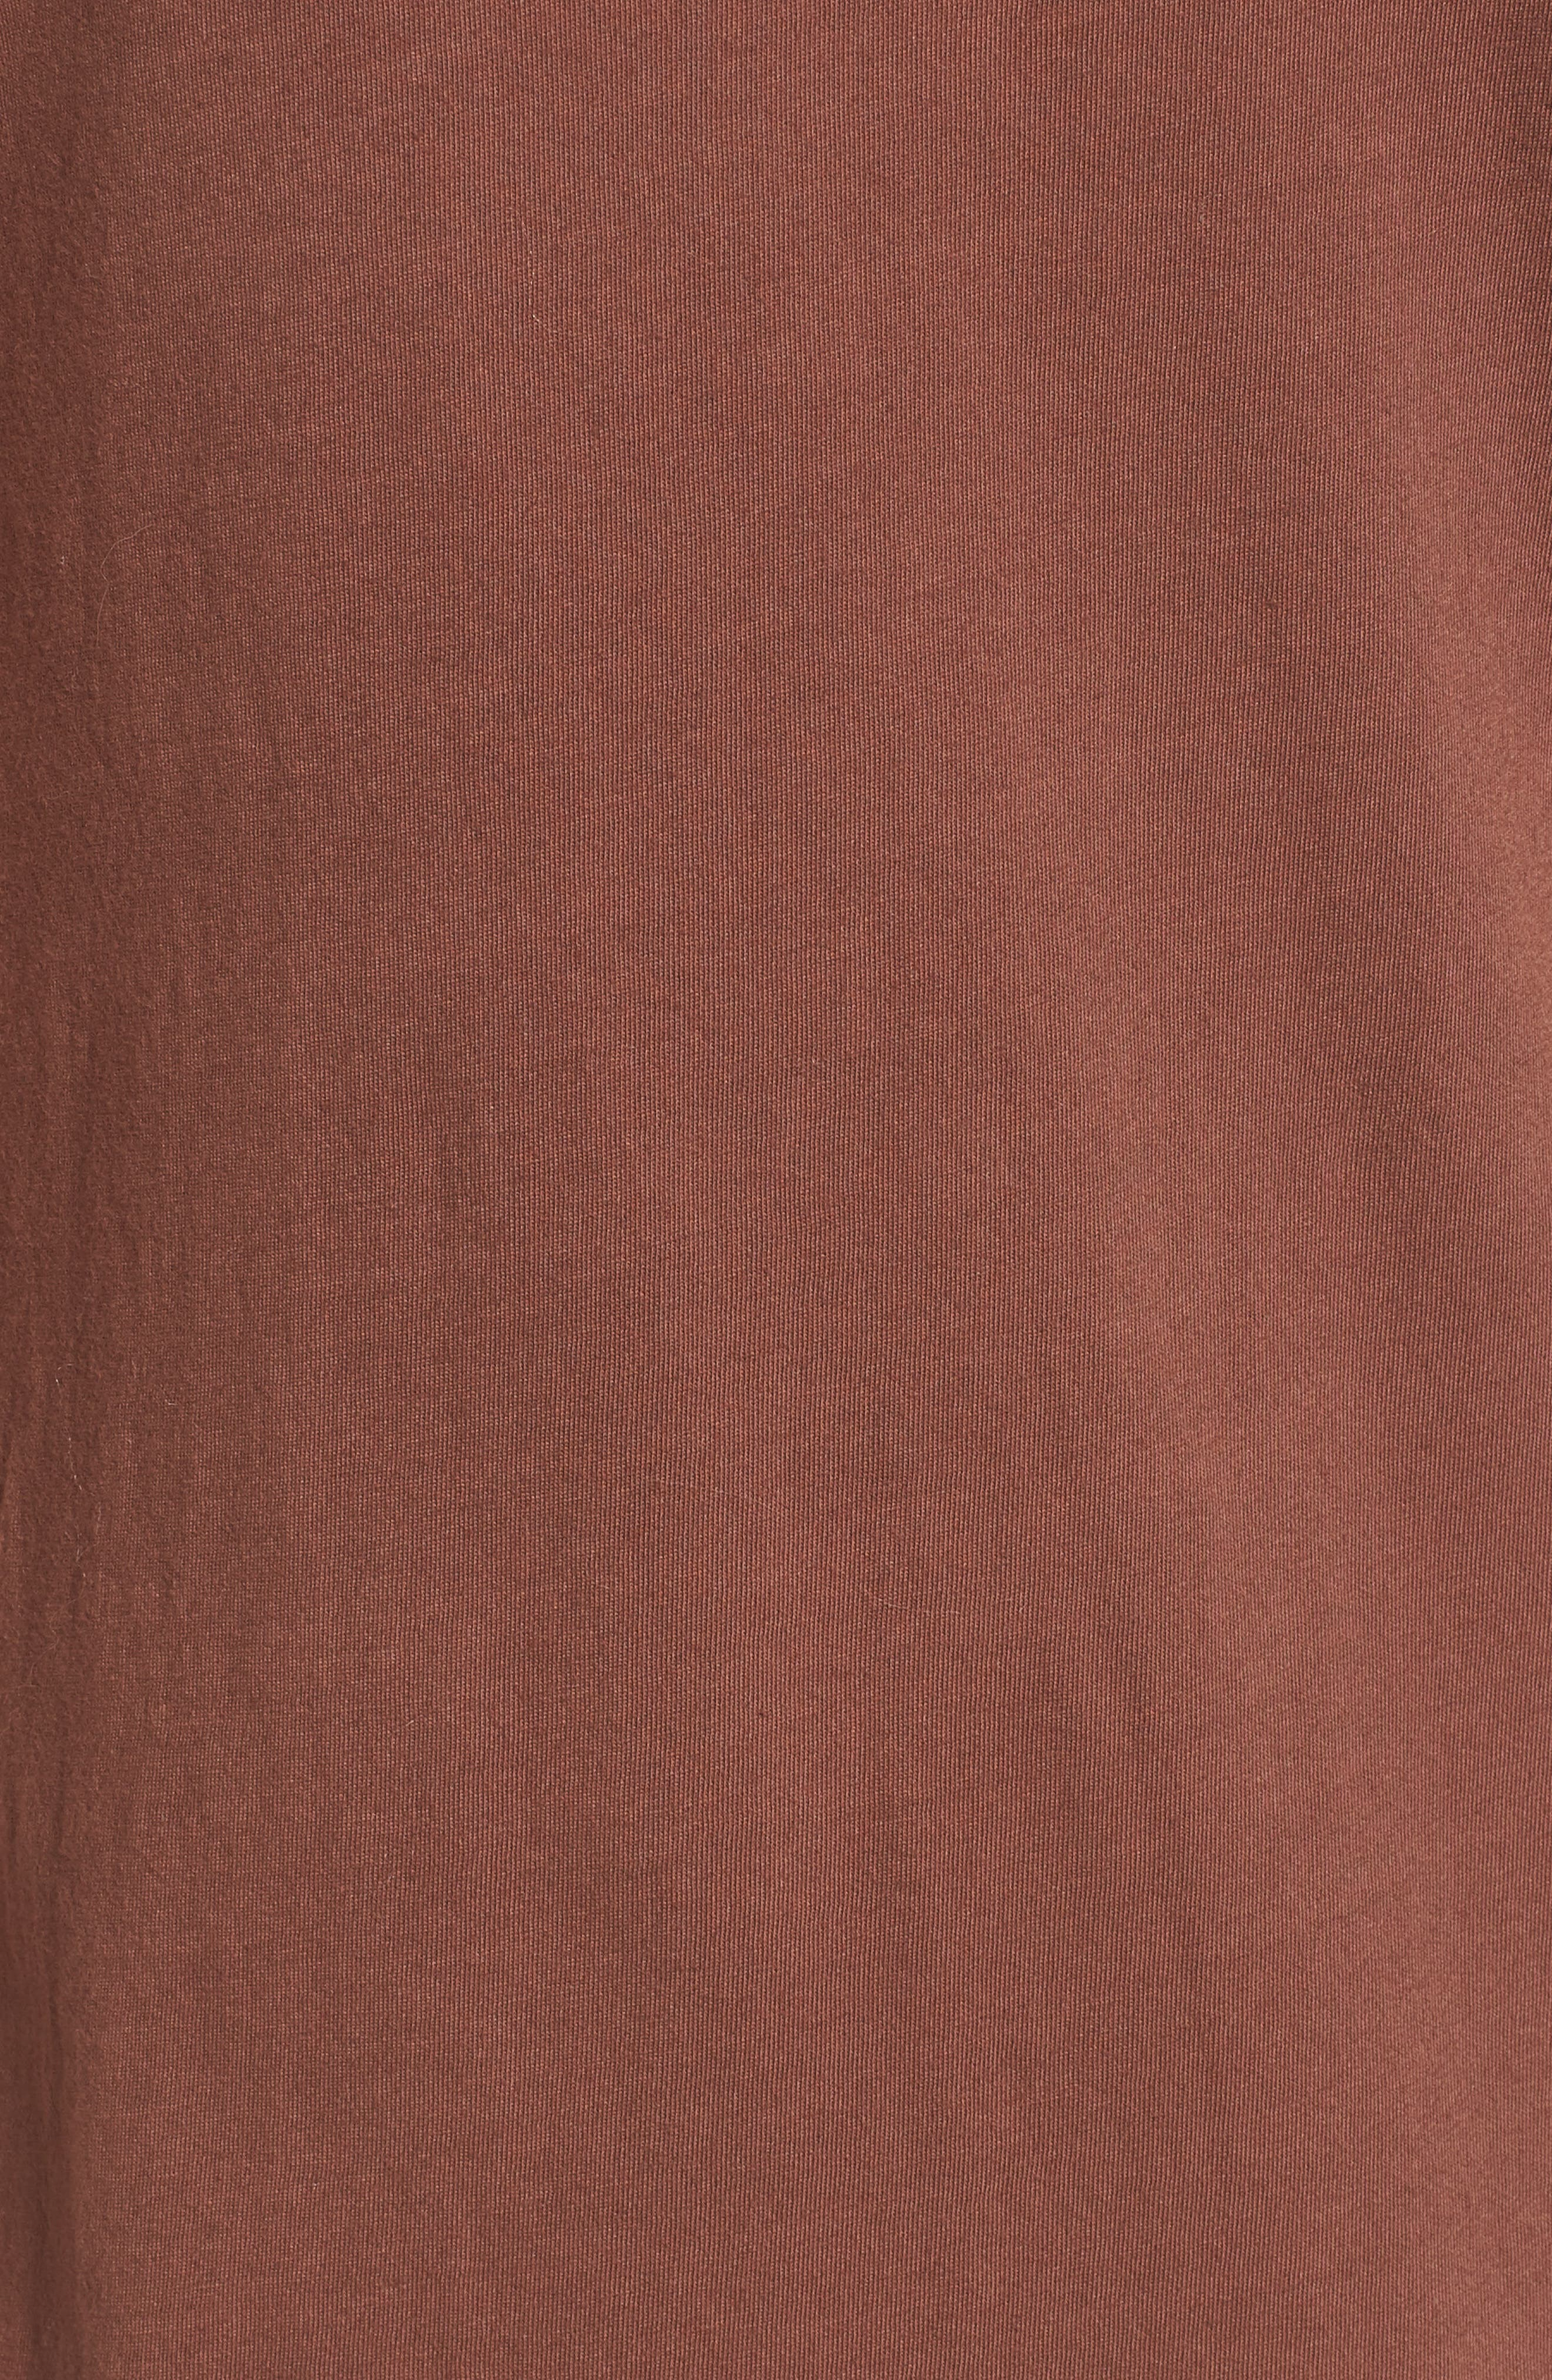 Alana Side Slit T-Shirt Dress,                             Alternate thumbnail 6, color,                             Nutmeg